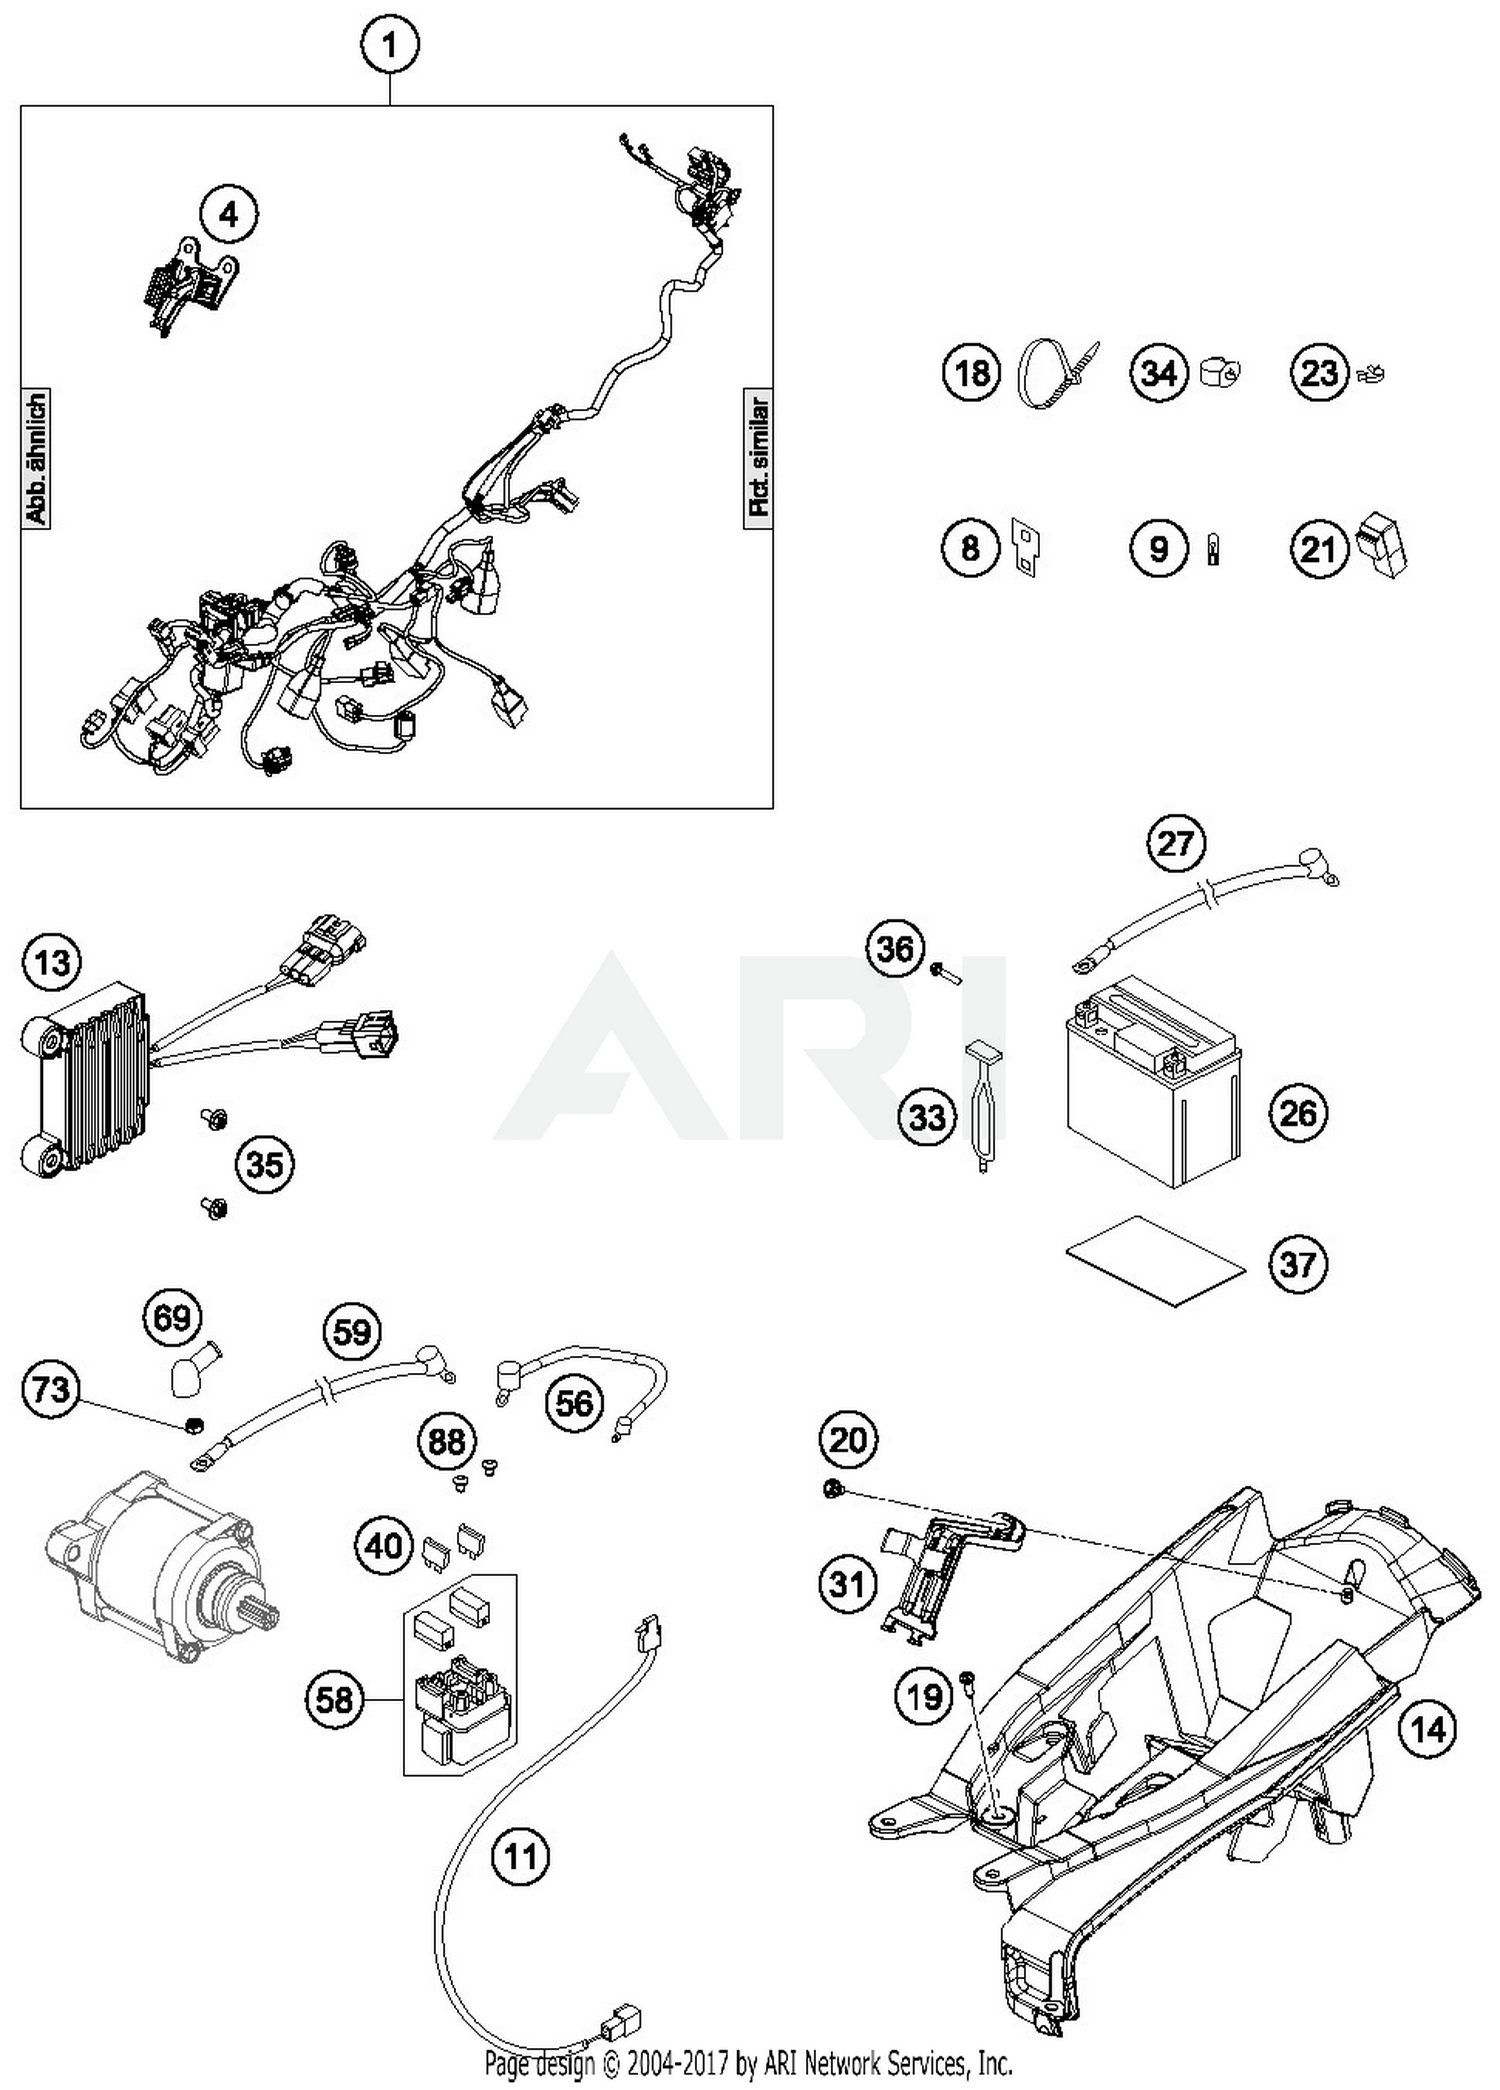 Husqvarna Light Wiring Schematic on dixon wiring schematic, john deere wiring schematic, genie wiring schematic, electrolux wiring schematic, volvo wiring schematic, yanmar wiring schematic, honda wiring schematic, yamaha wiring schematic, exmark wiring schematic, poulan pro wiring schematic, isuzu wiring schematic, simplicity wiring schematic, kohler wiring schematic, vespa wiring schematic, victory wiring schematic, craftsman wiring schematic, ford wiring schematic, jcb wiring schematic, snapper wiring schematic, new holland wiring schematic,